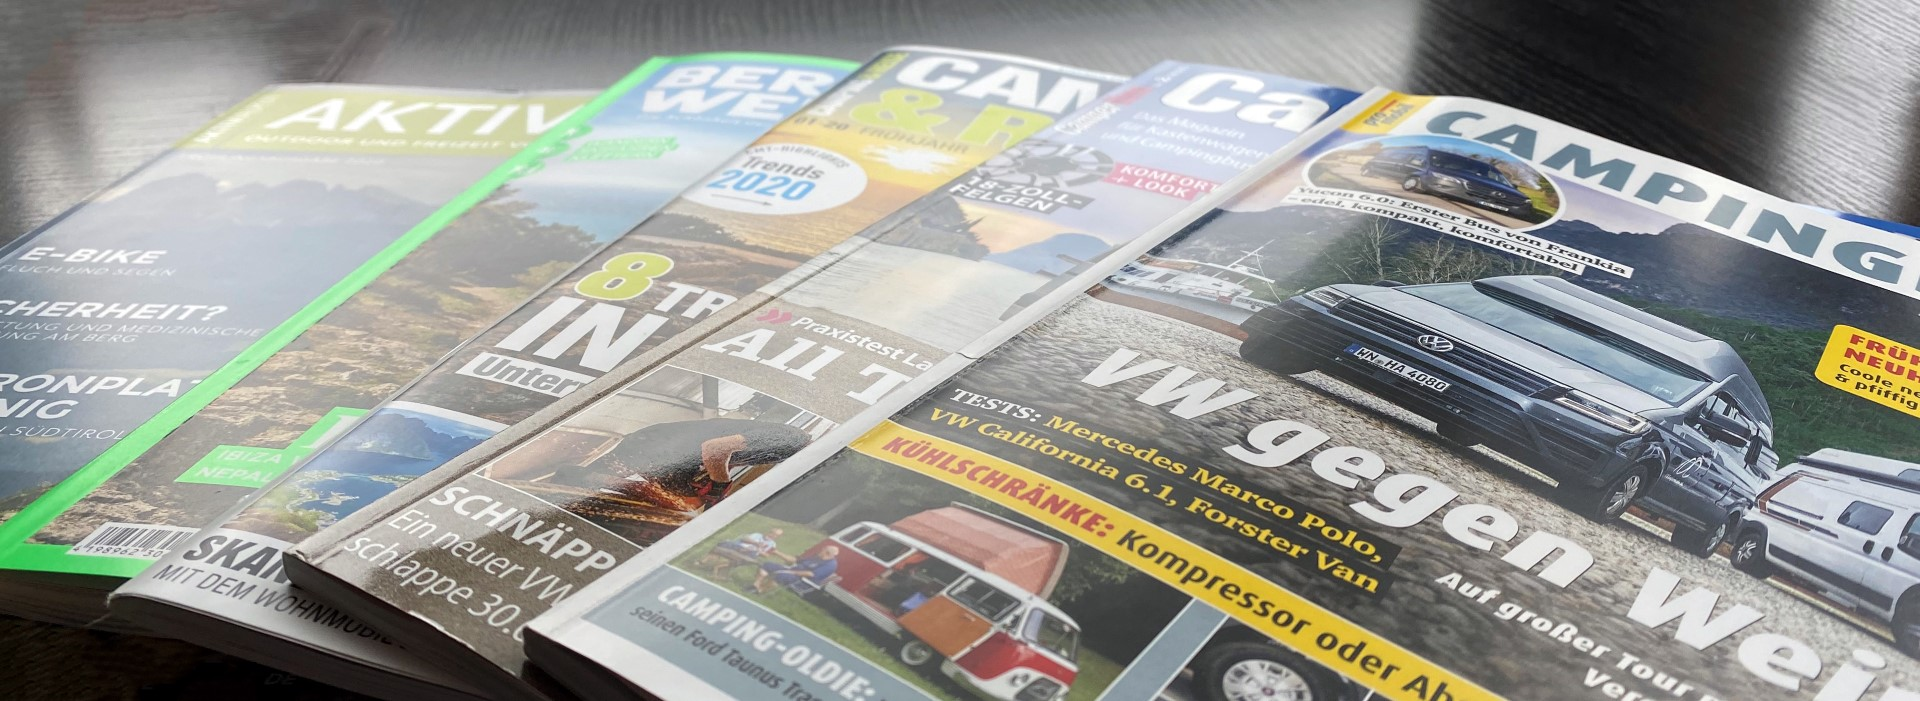 Top 5 Magazine Zeitschriften